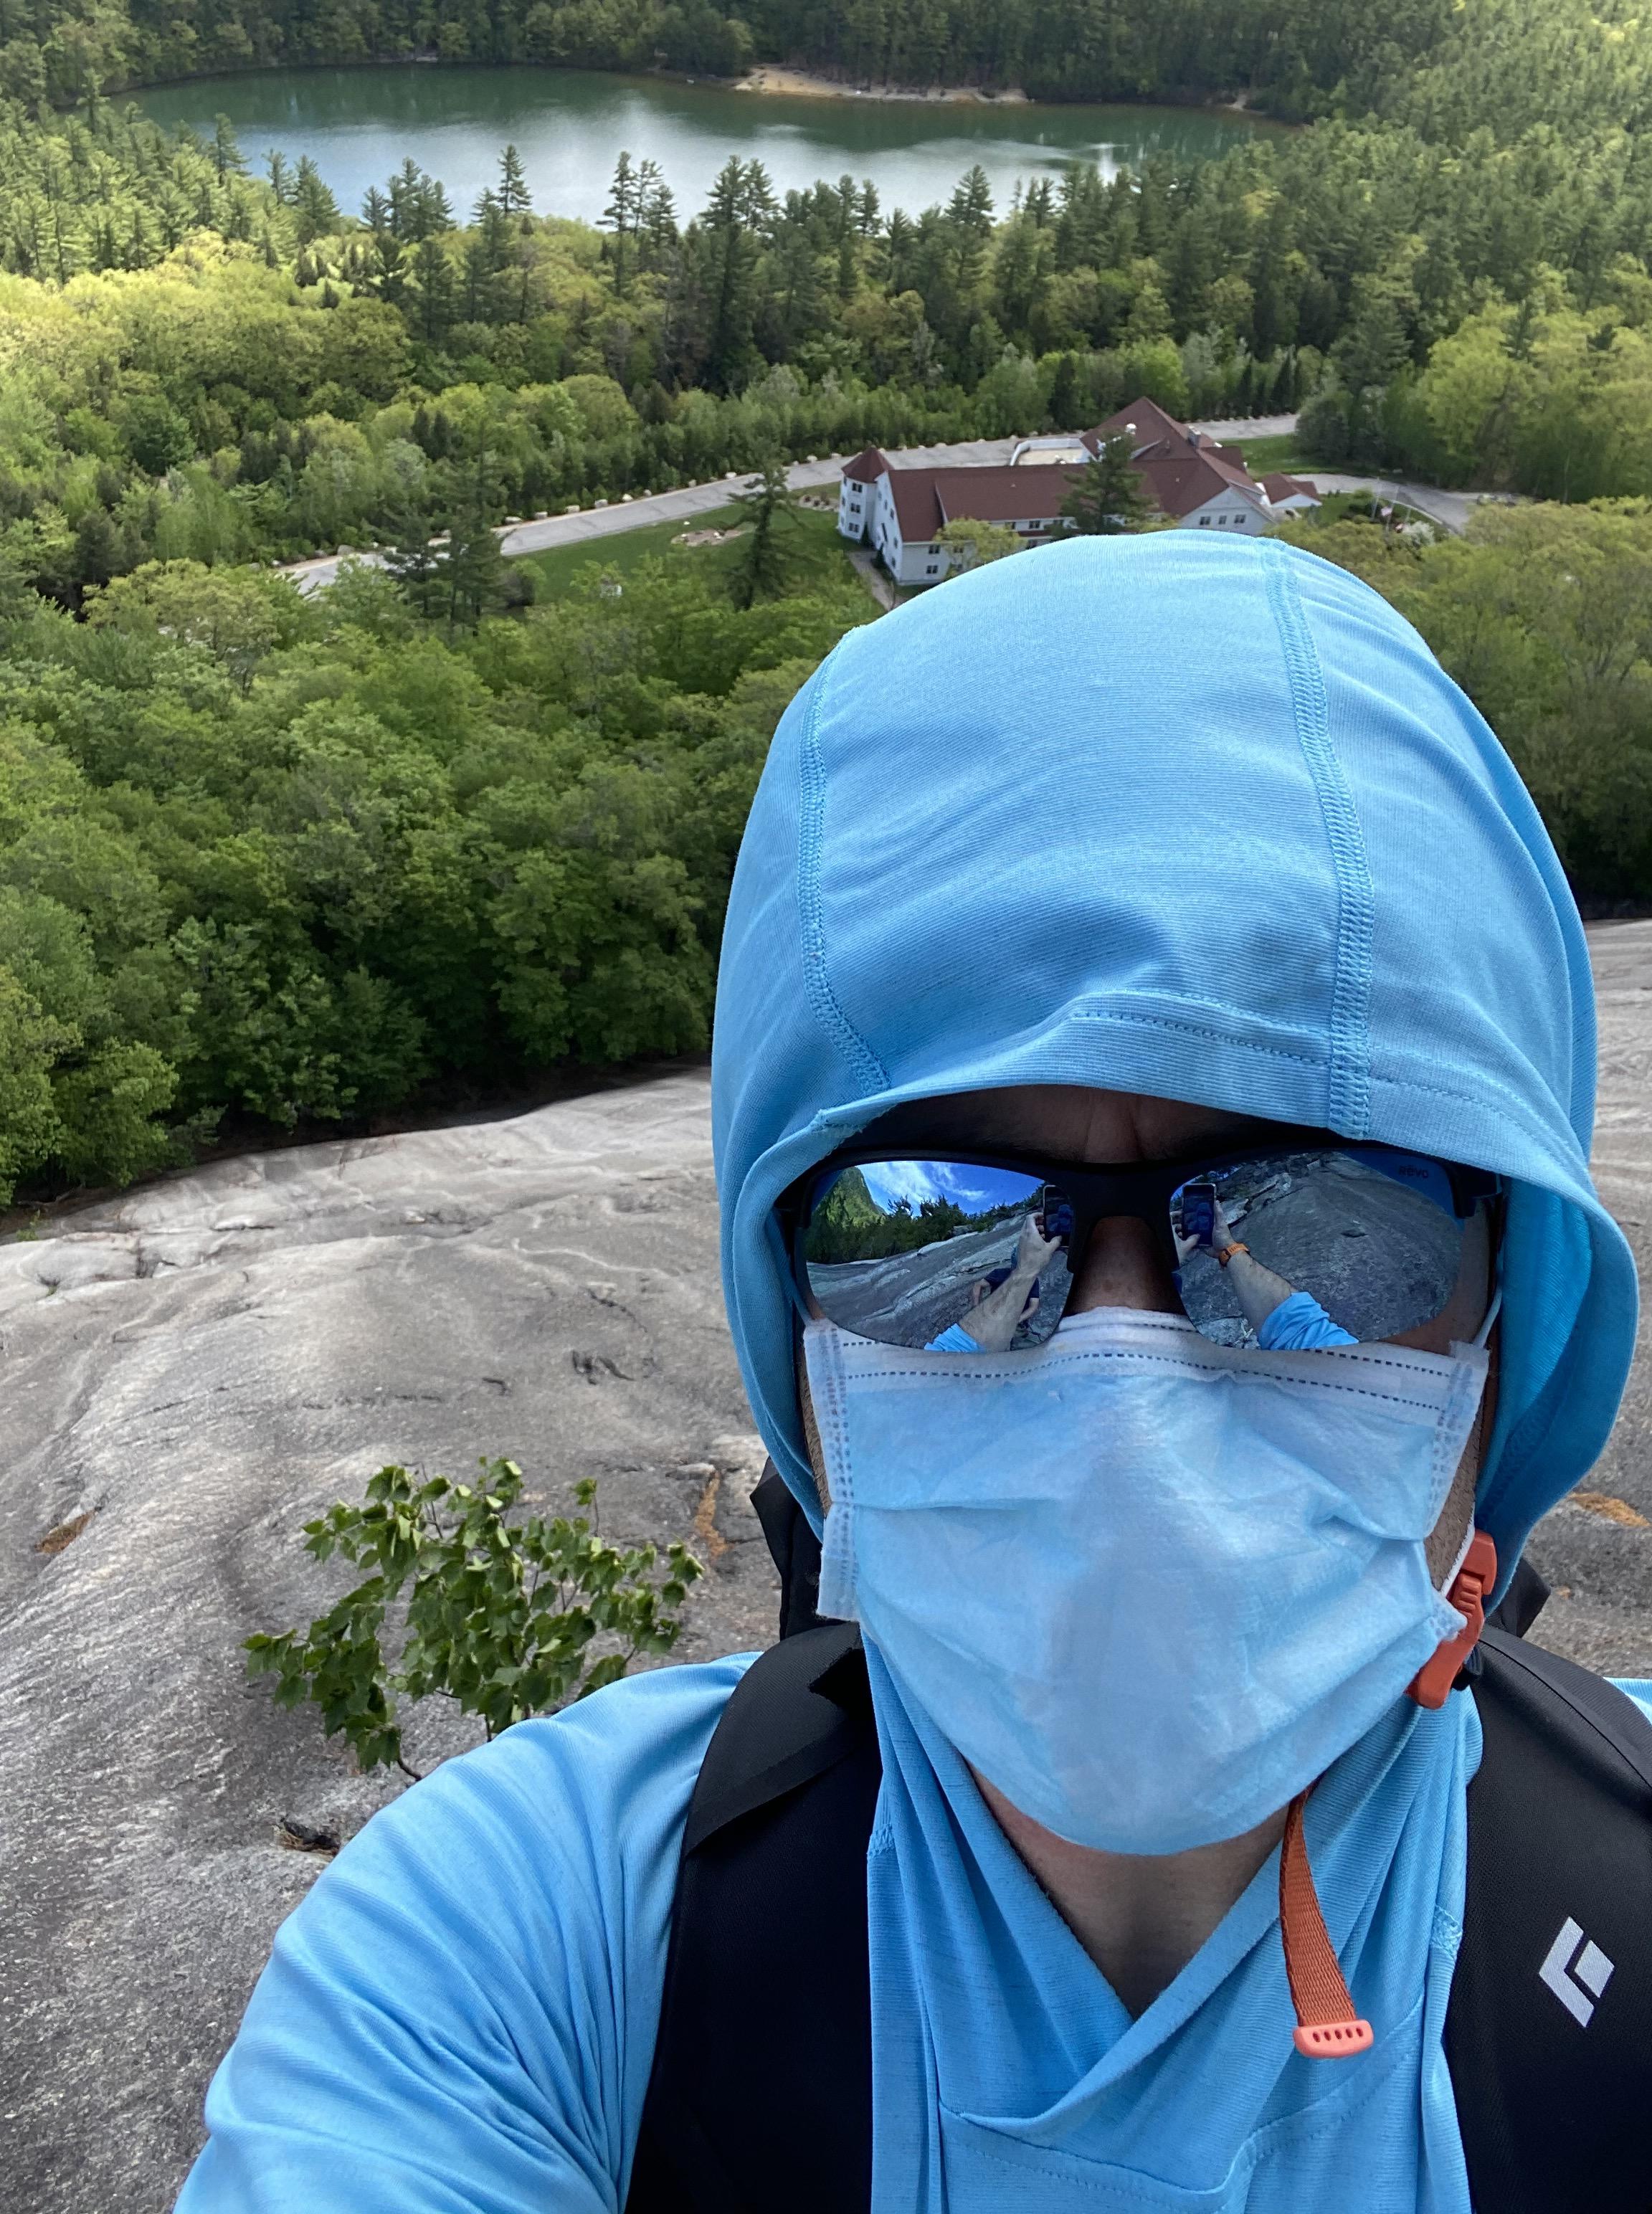 Rock Climbing During Covid-19 Coronavirus